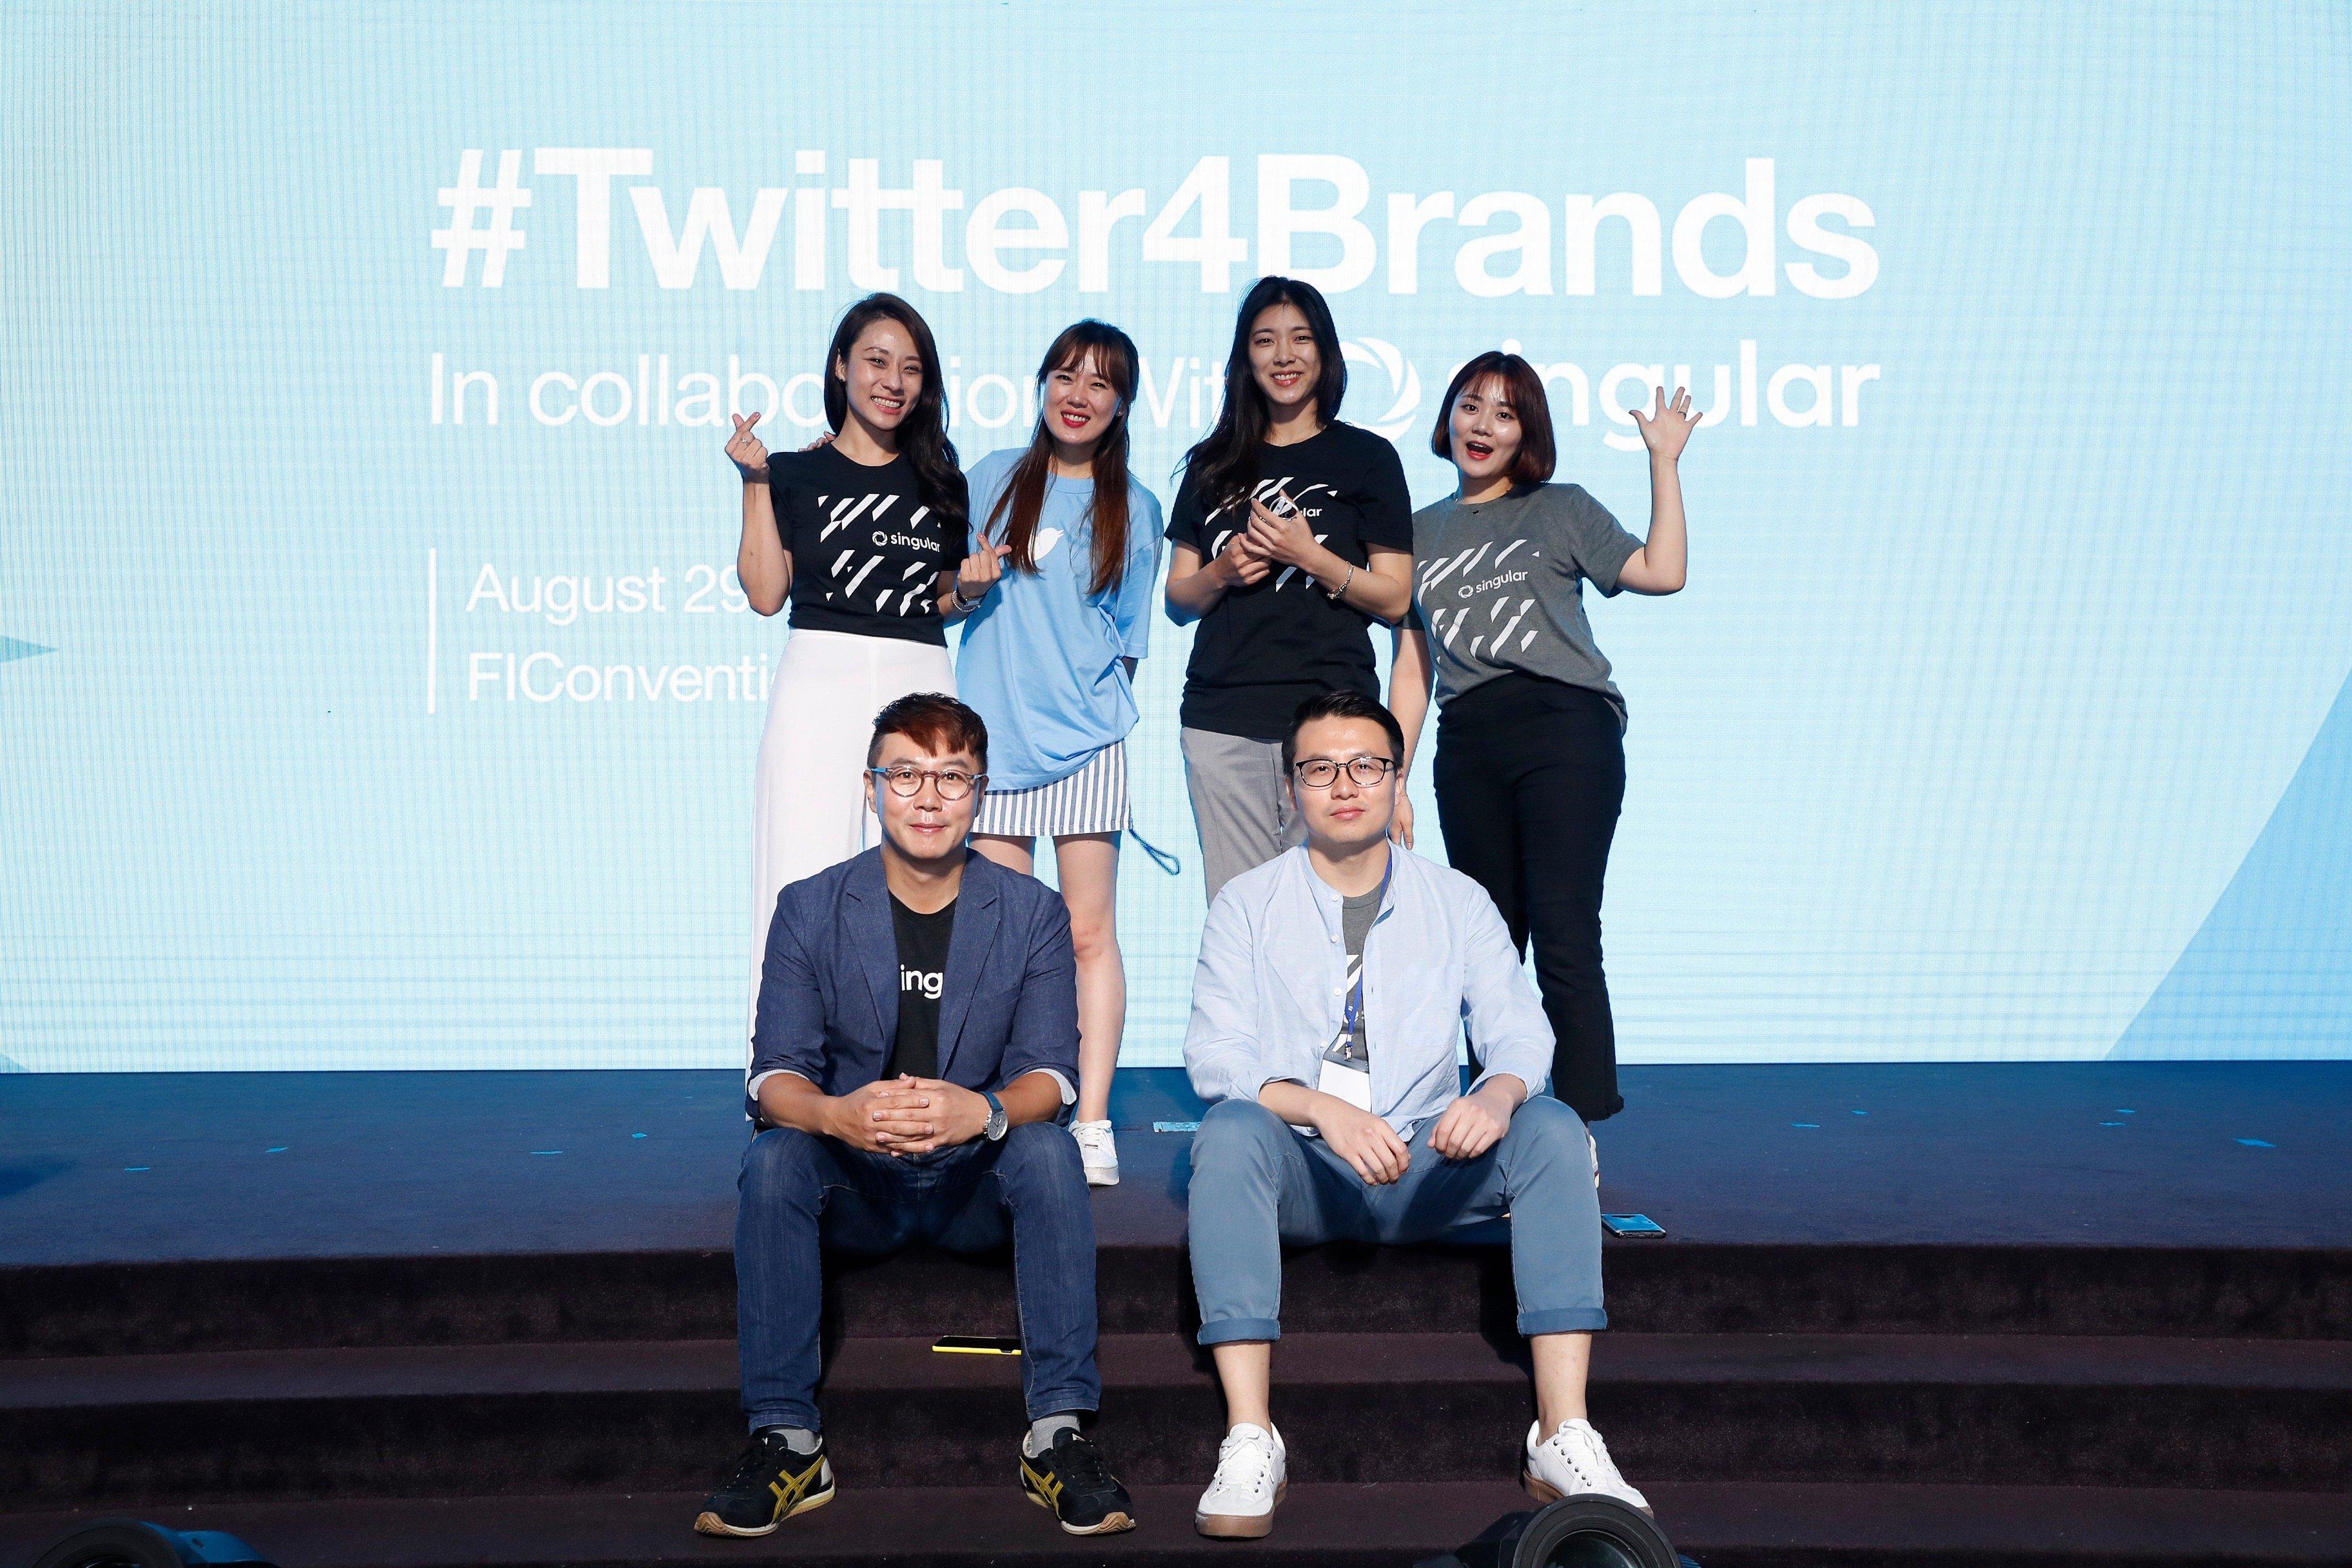 Singular Korea team posing for a photo at Kakao talk event